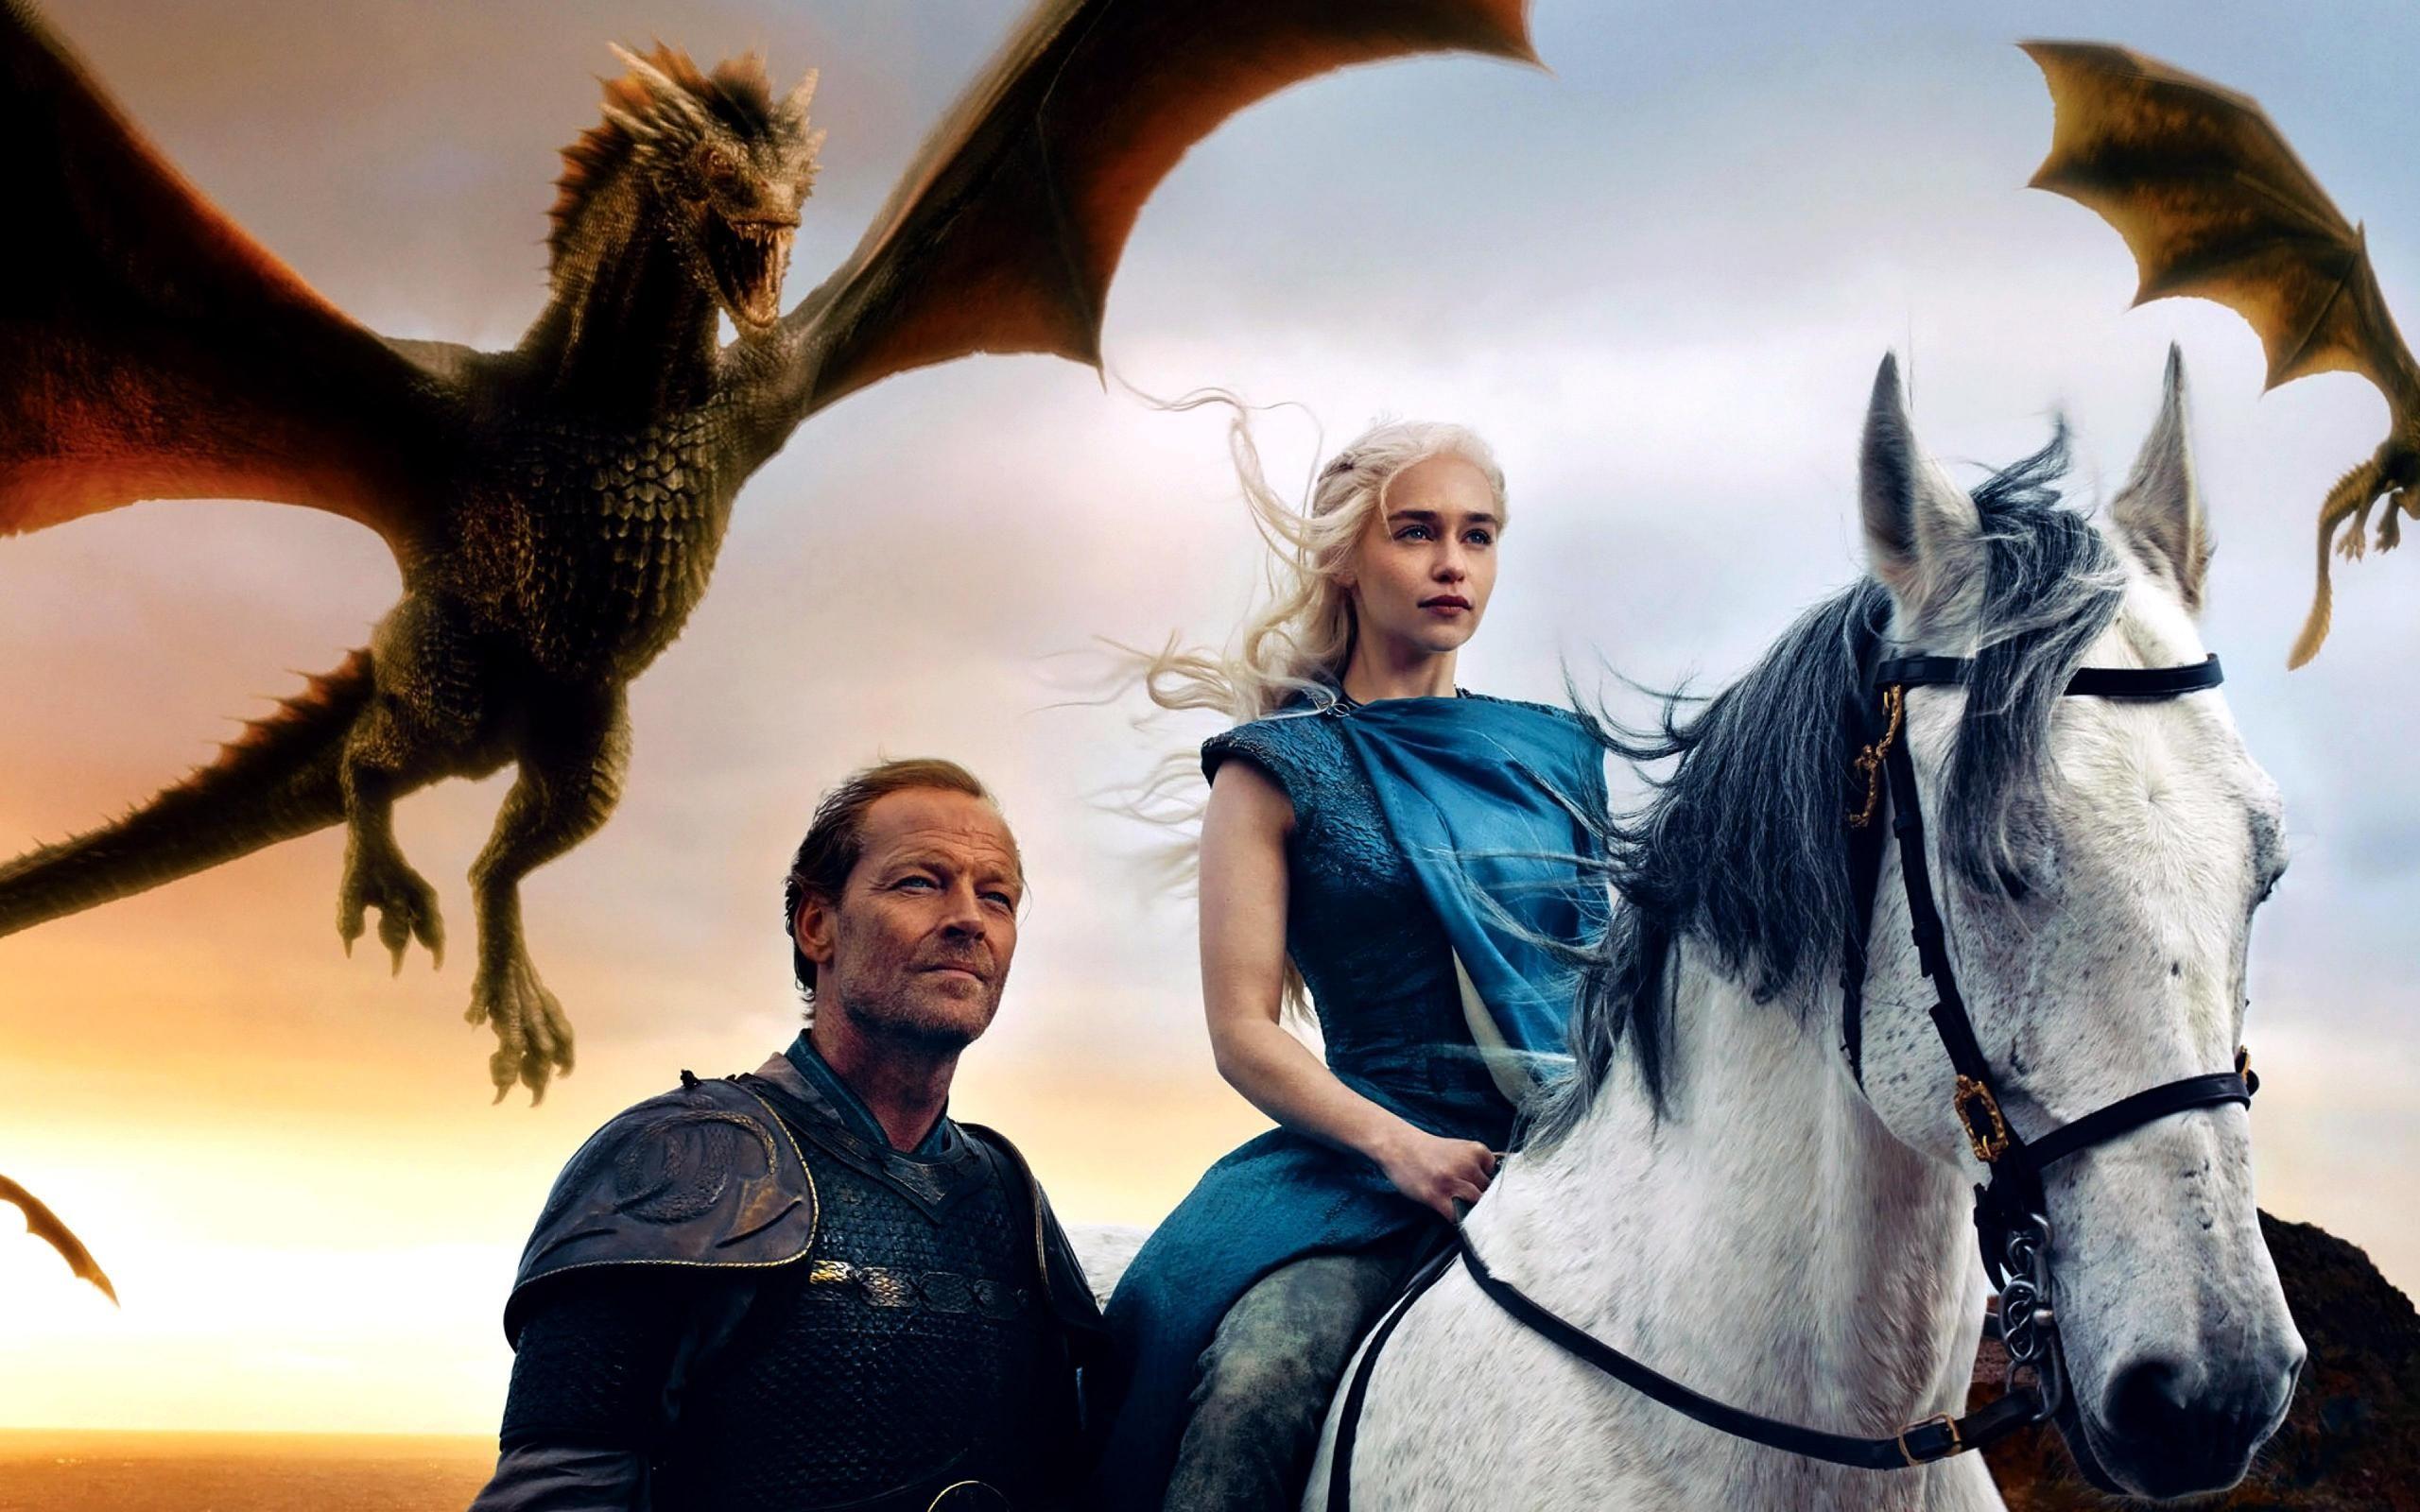 Pin by Druidda on Daenerys Targaryen [Emilia Clarke